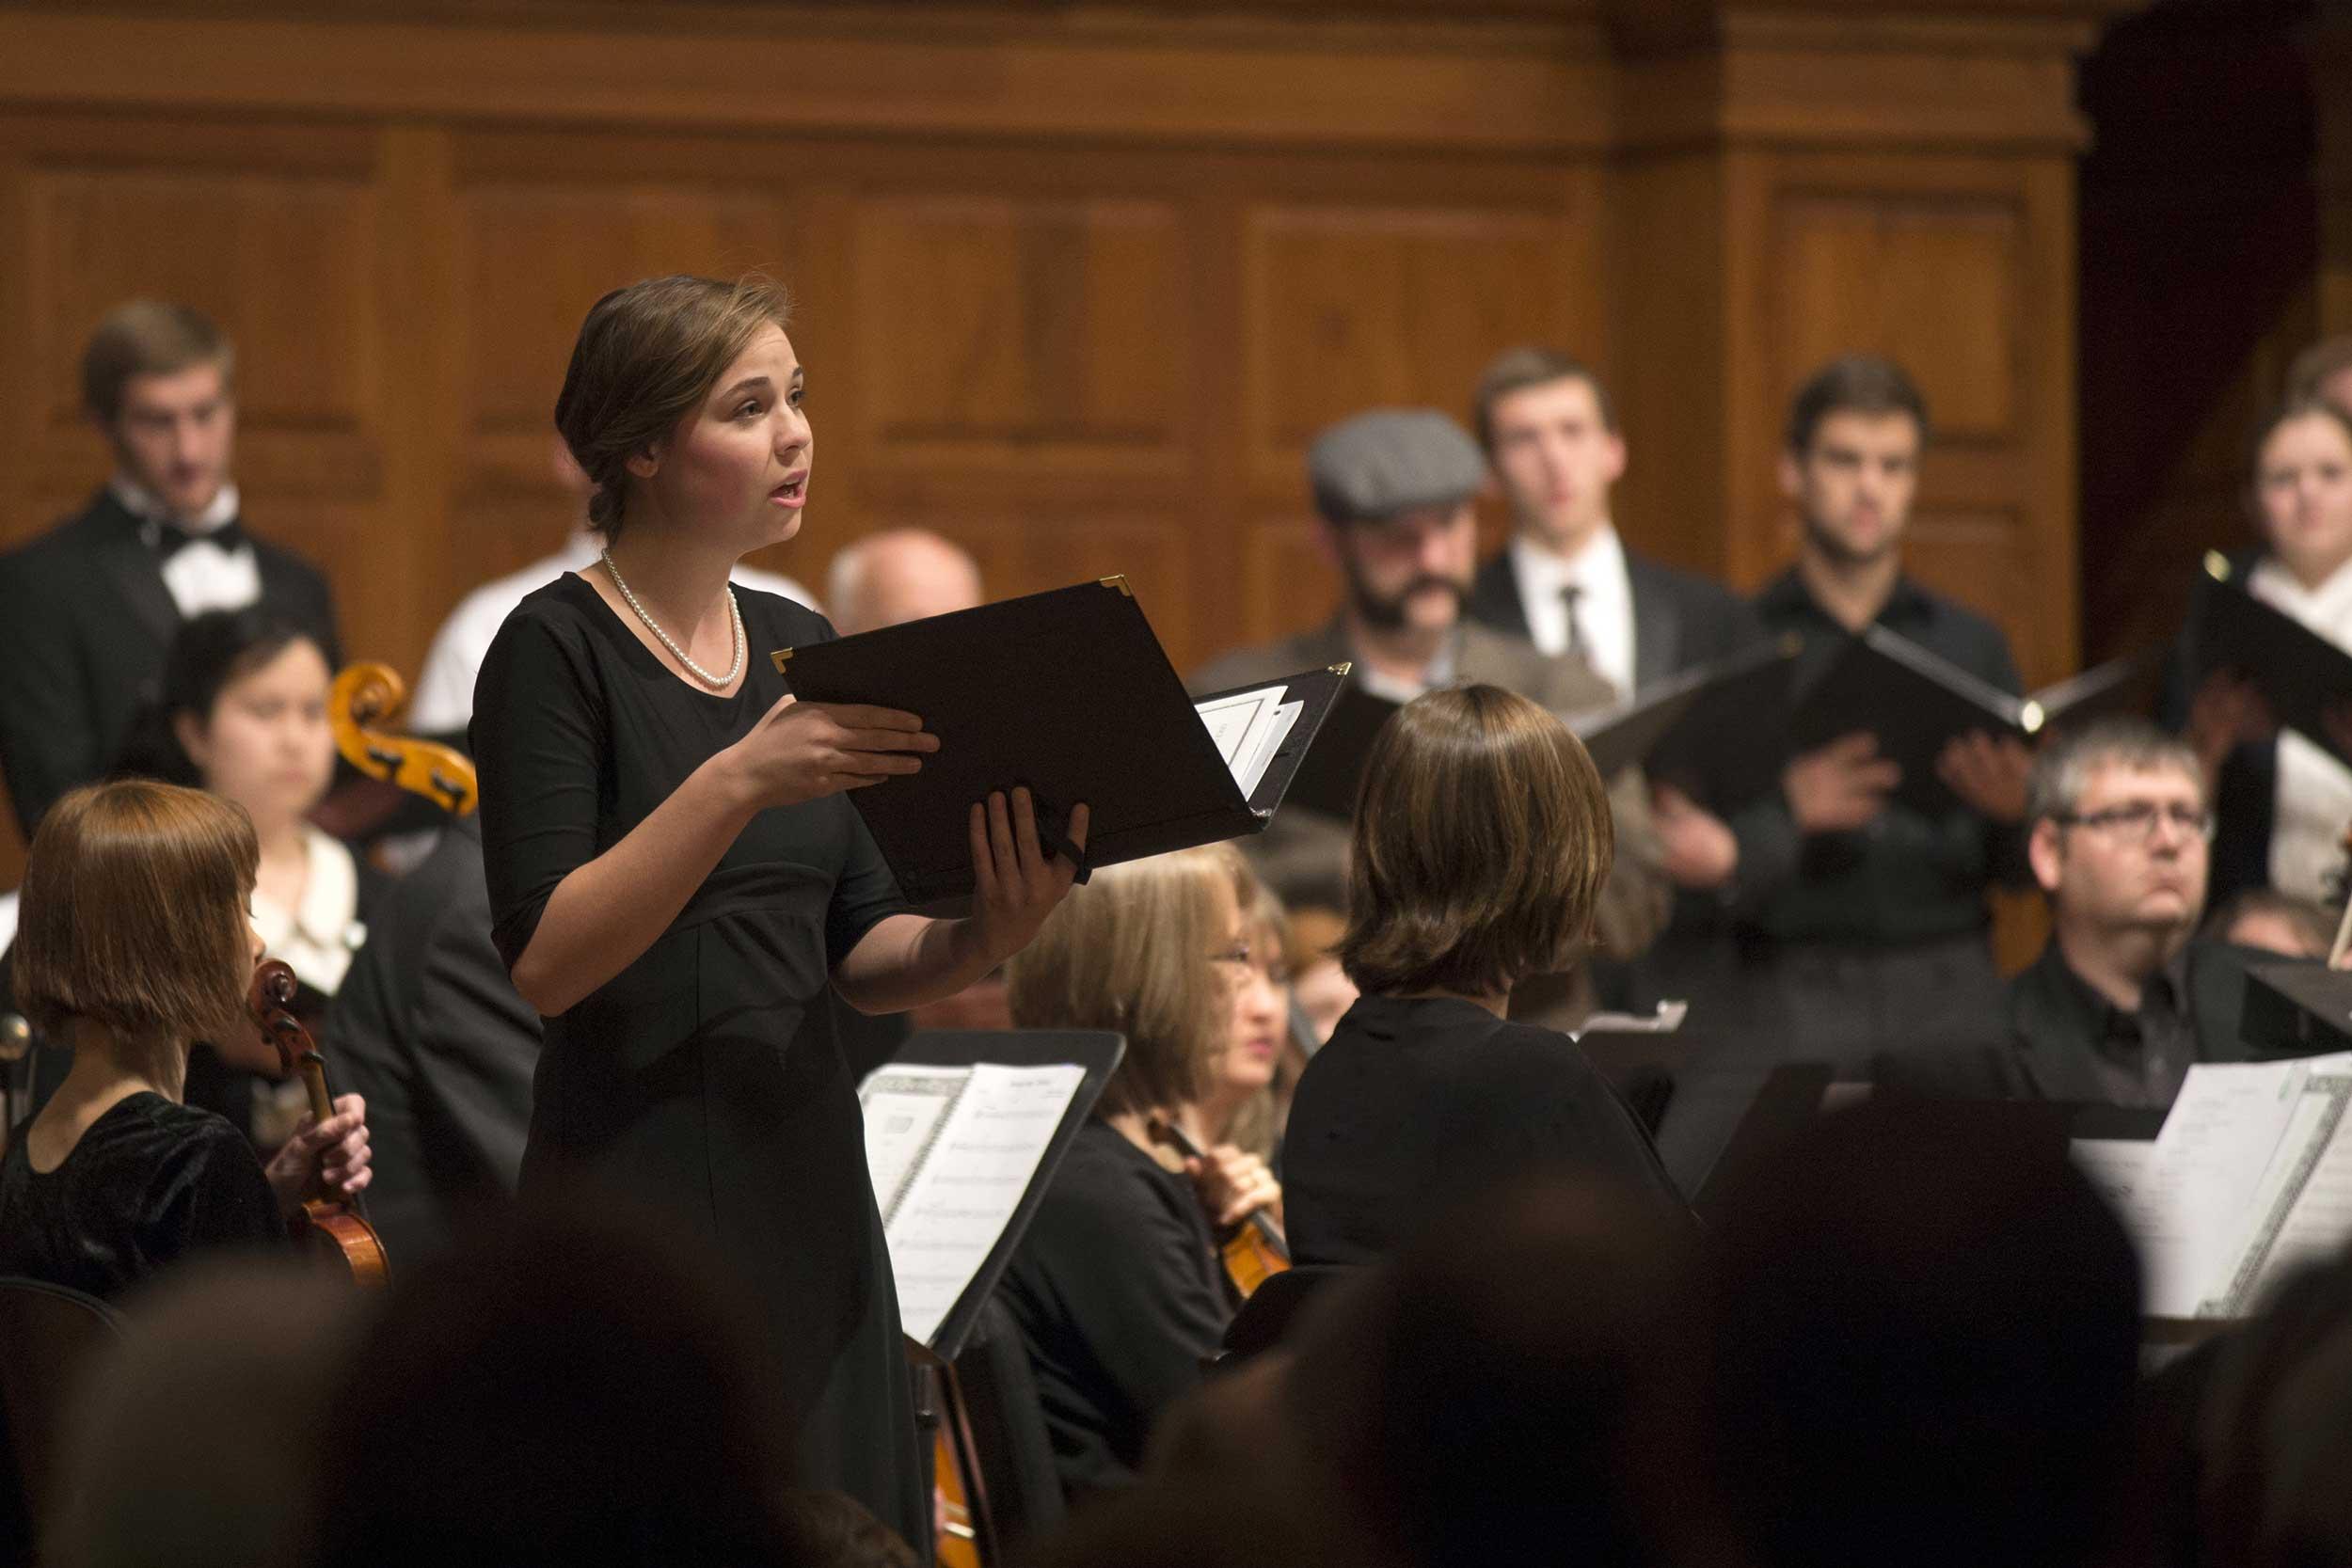 Hesston College Performing Arts